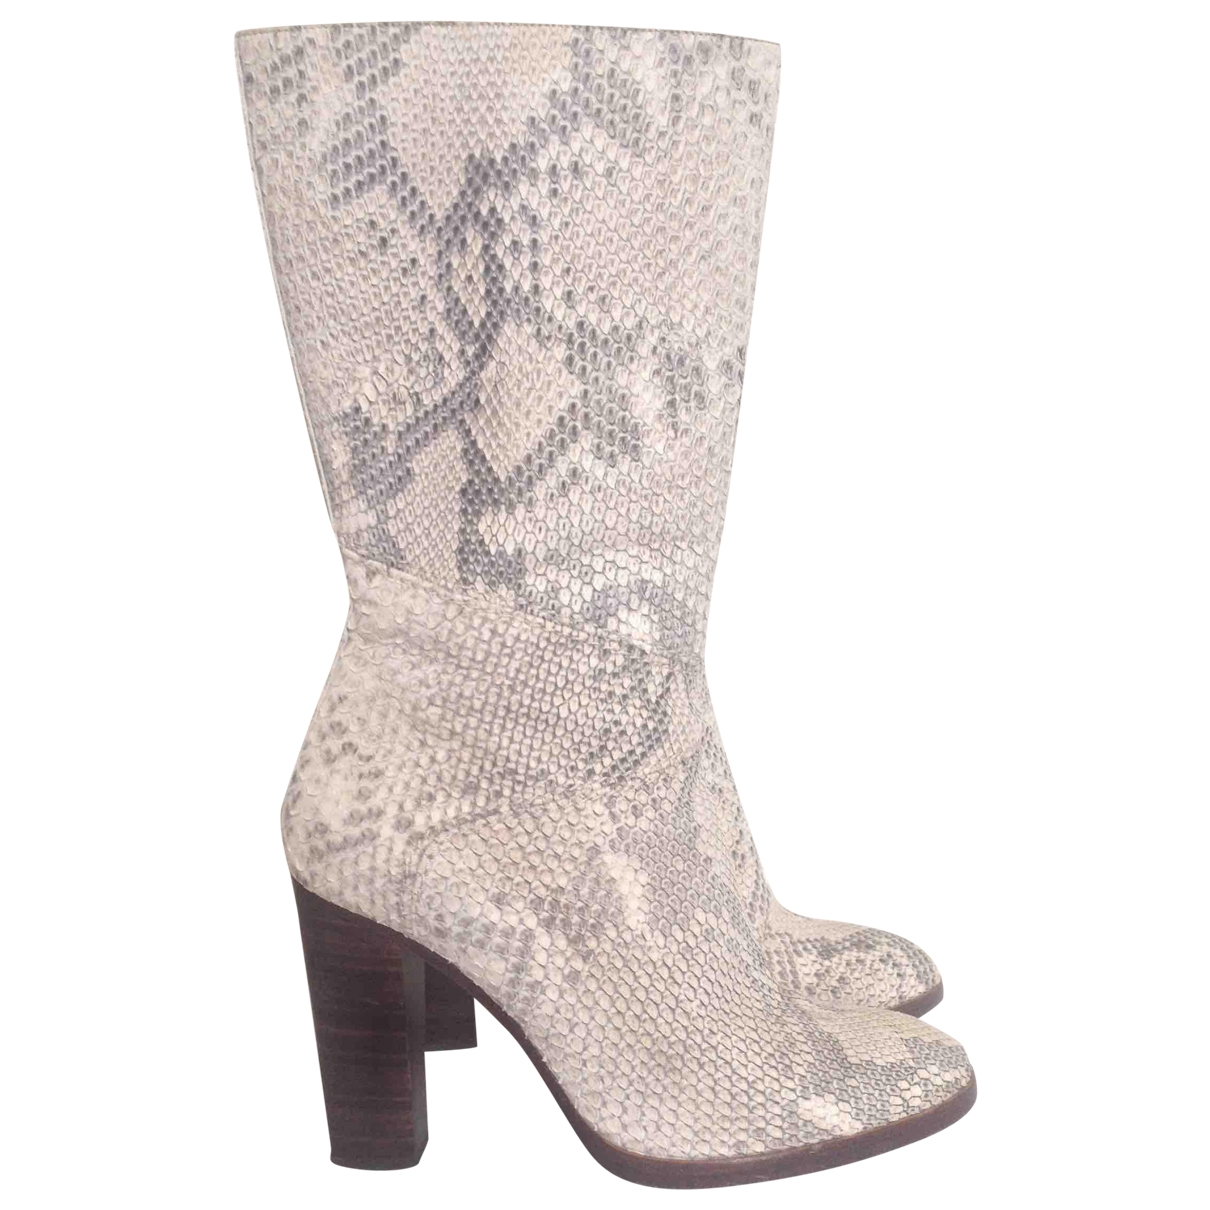 Chloé \N Ecru Python Boots for Women 38 EU